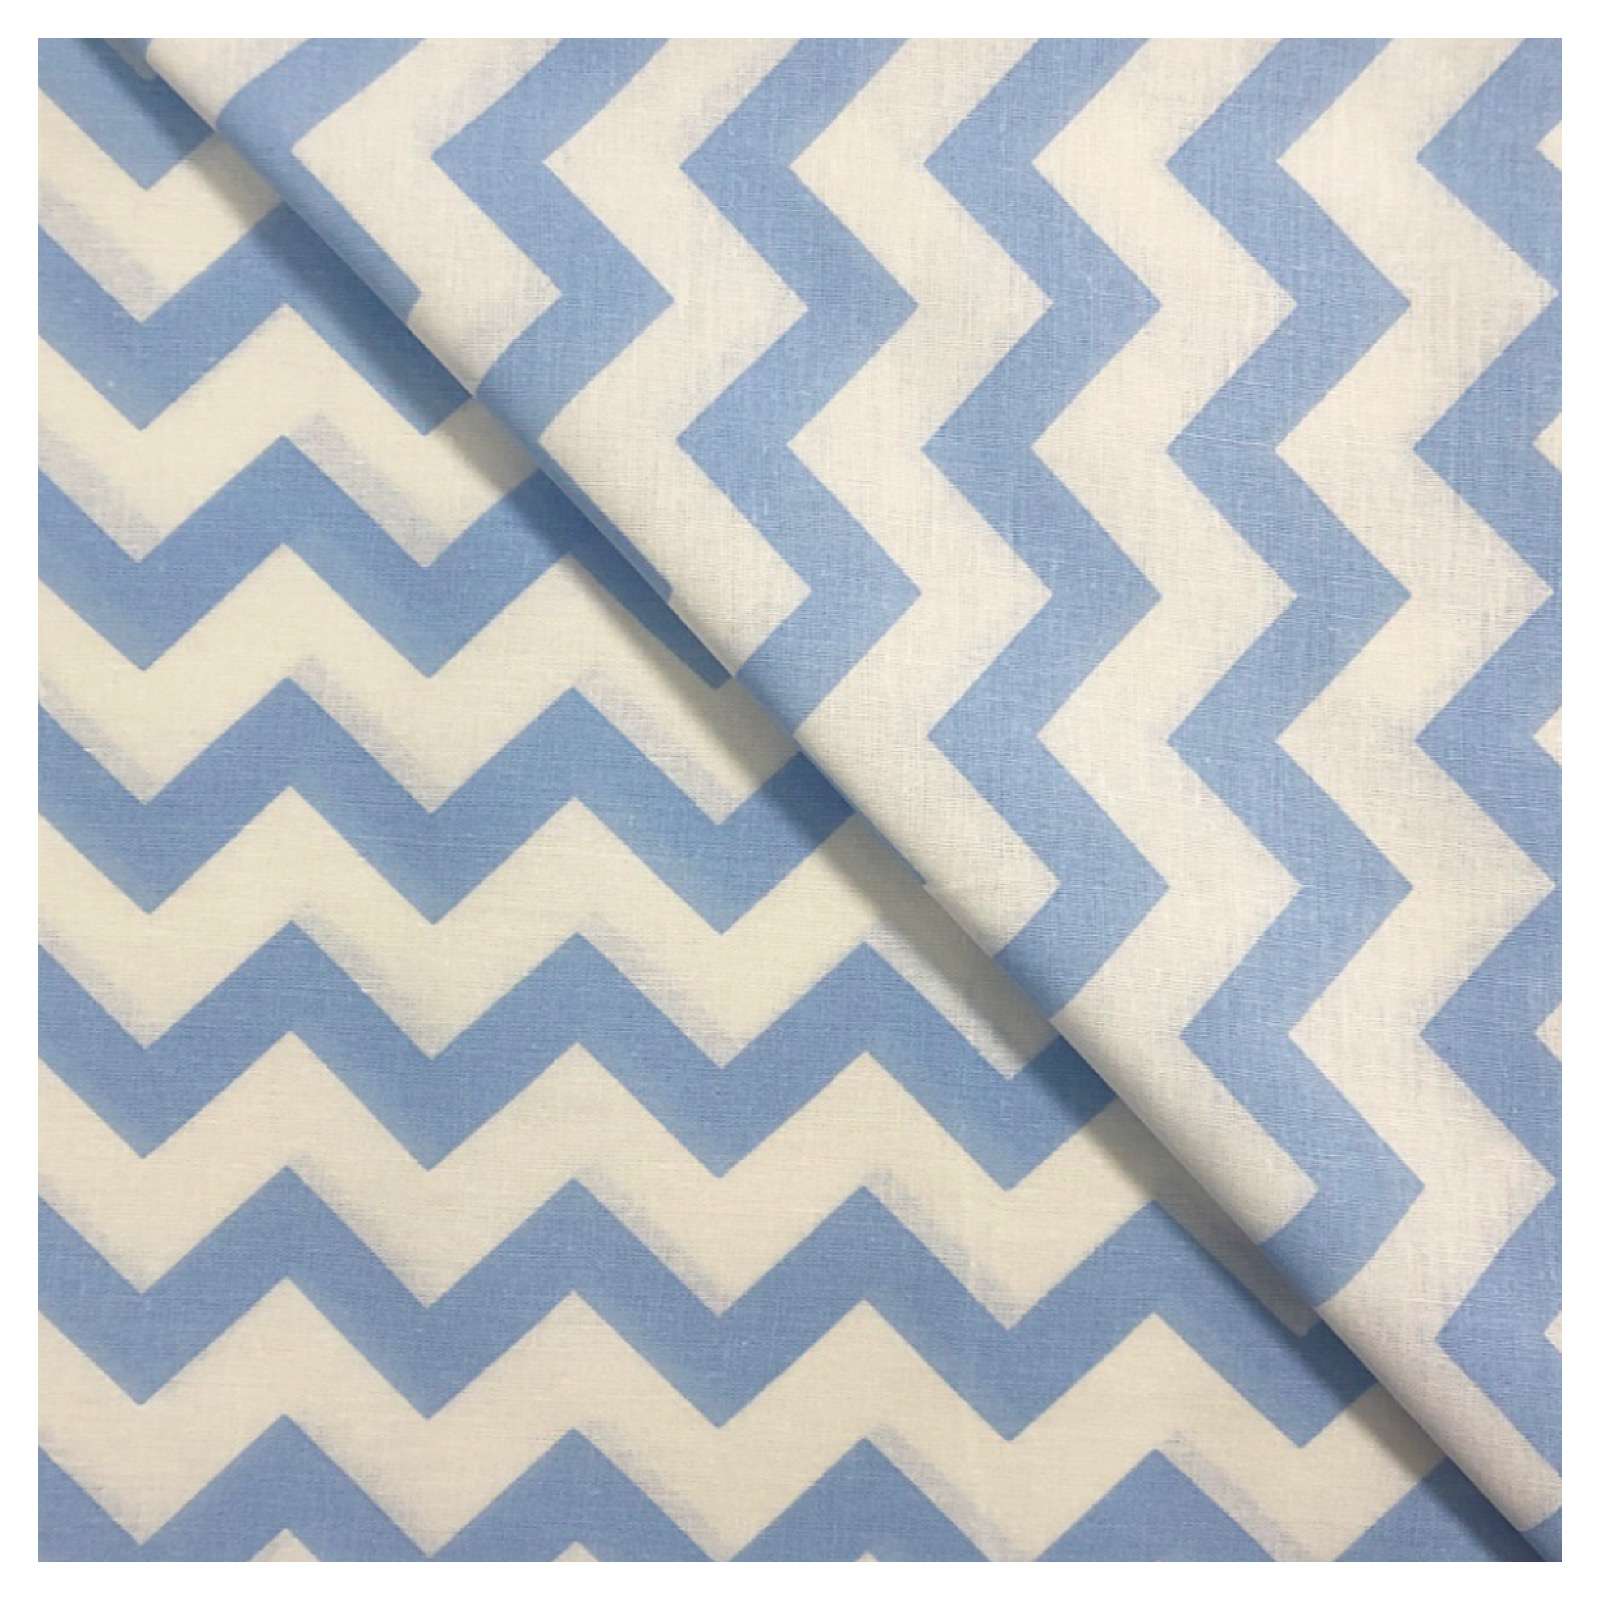 Ткань vebertex бязь ткань vebertex коалы книголюбы